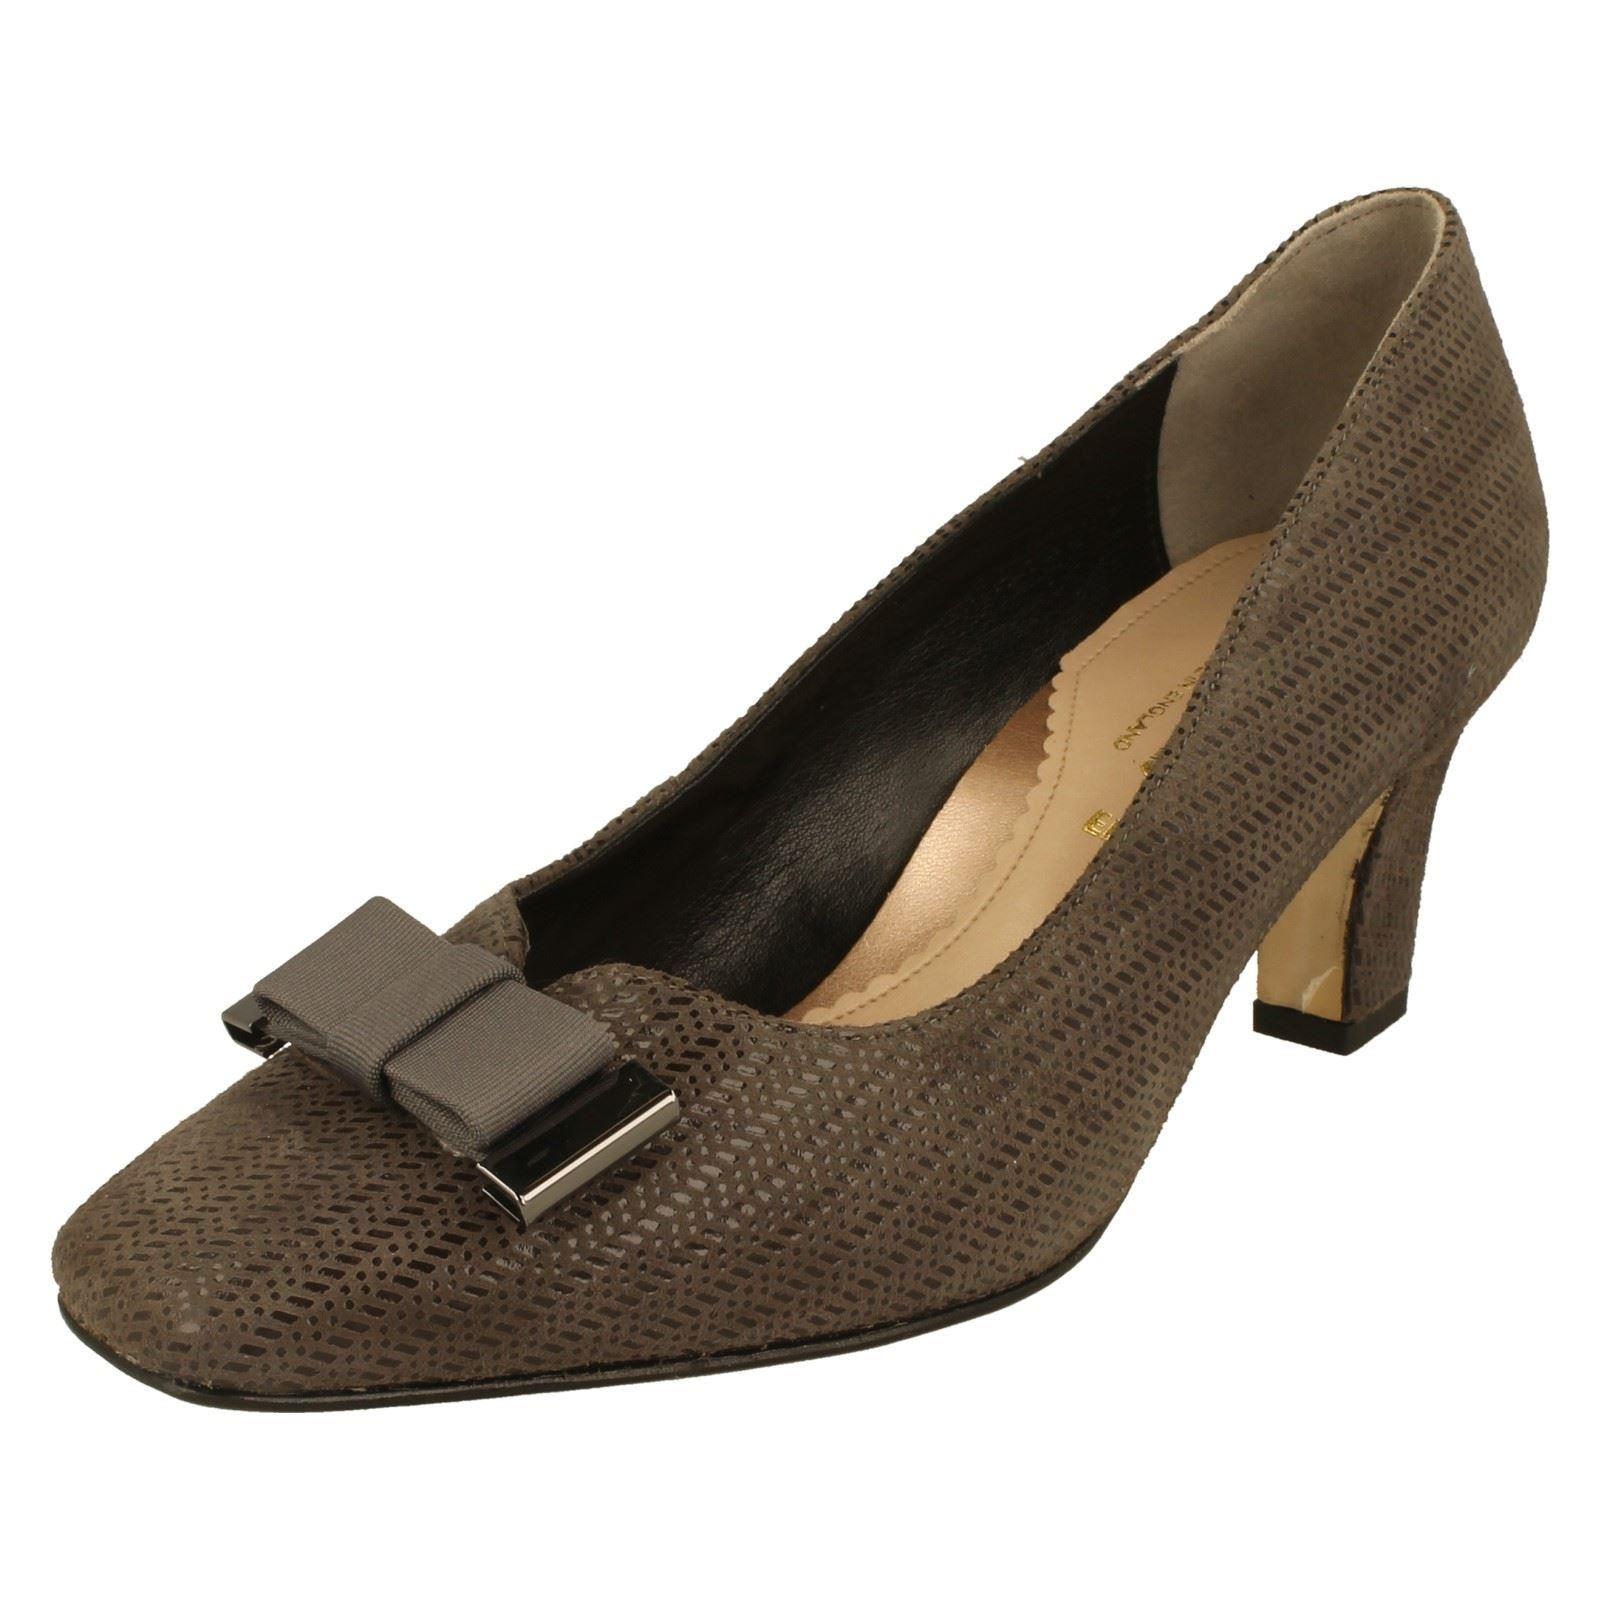 van dal shoes 6.5